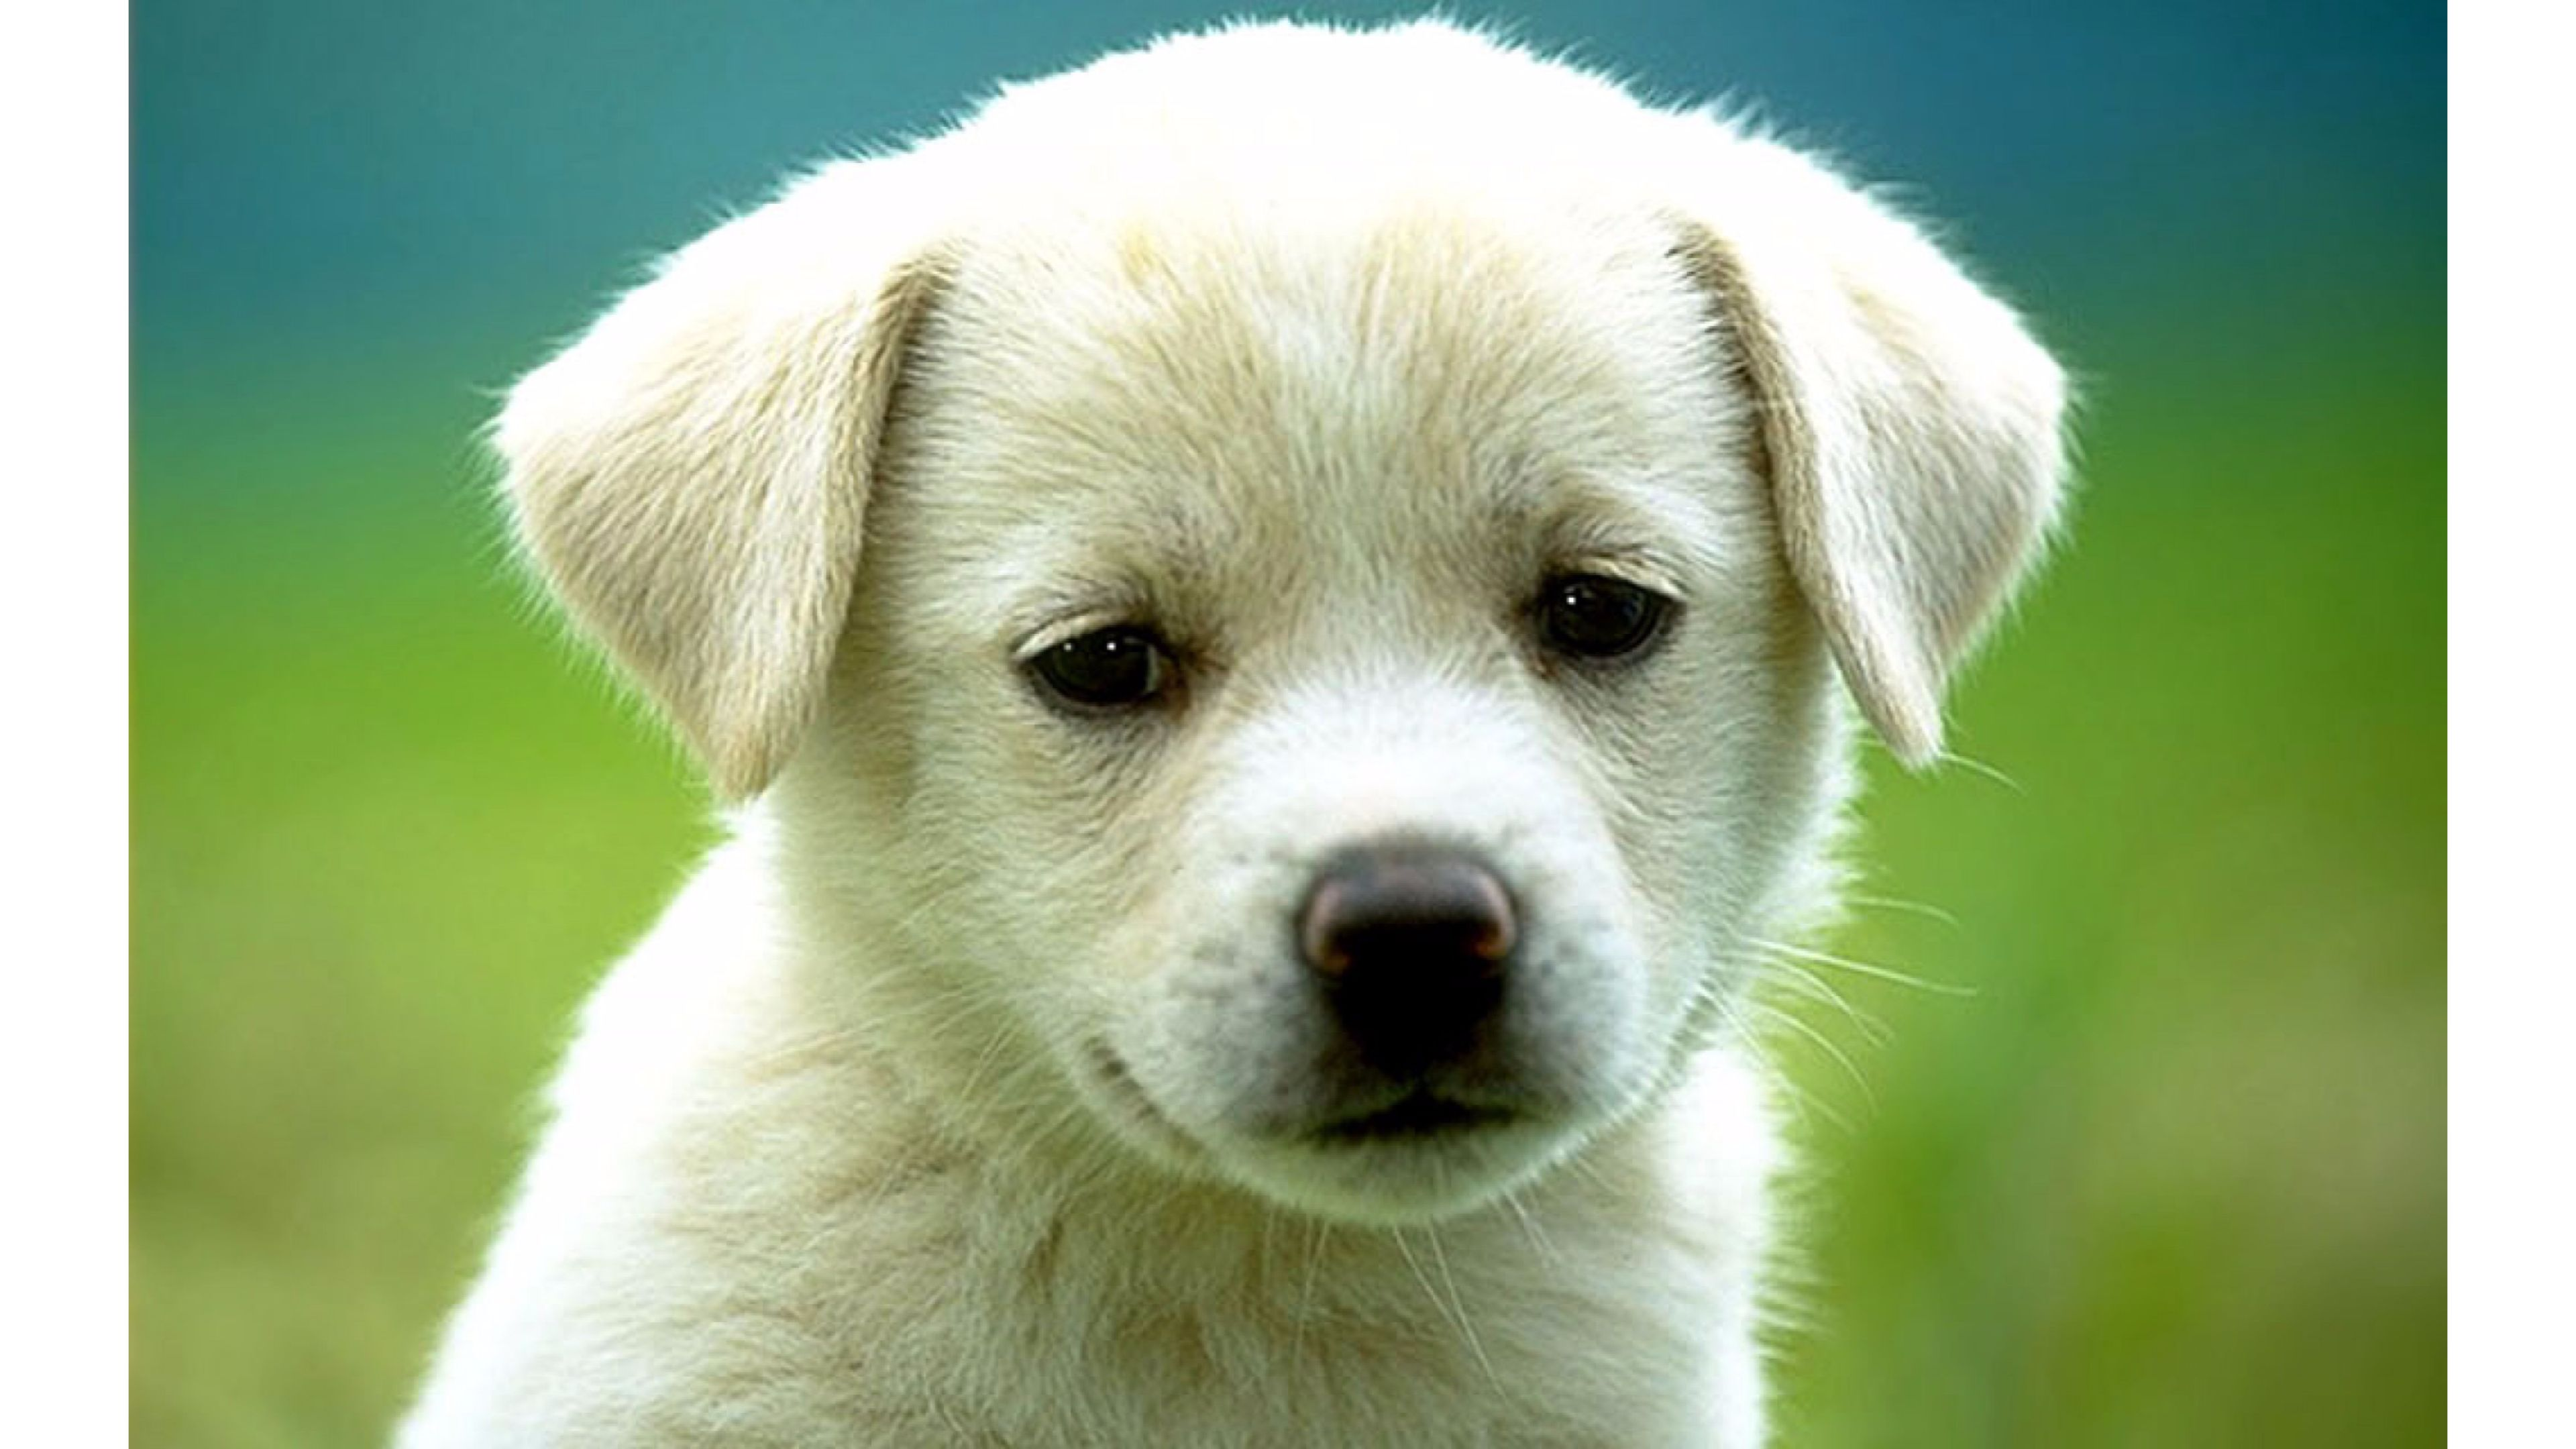 Cute White Dog 4K Wallpaper | Free 4K Wallpaper